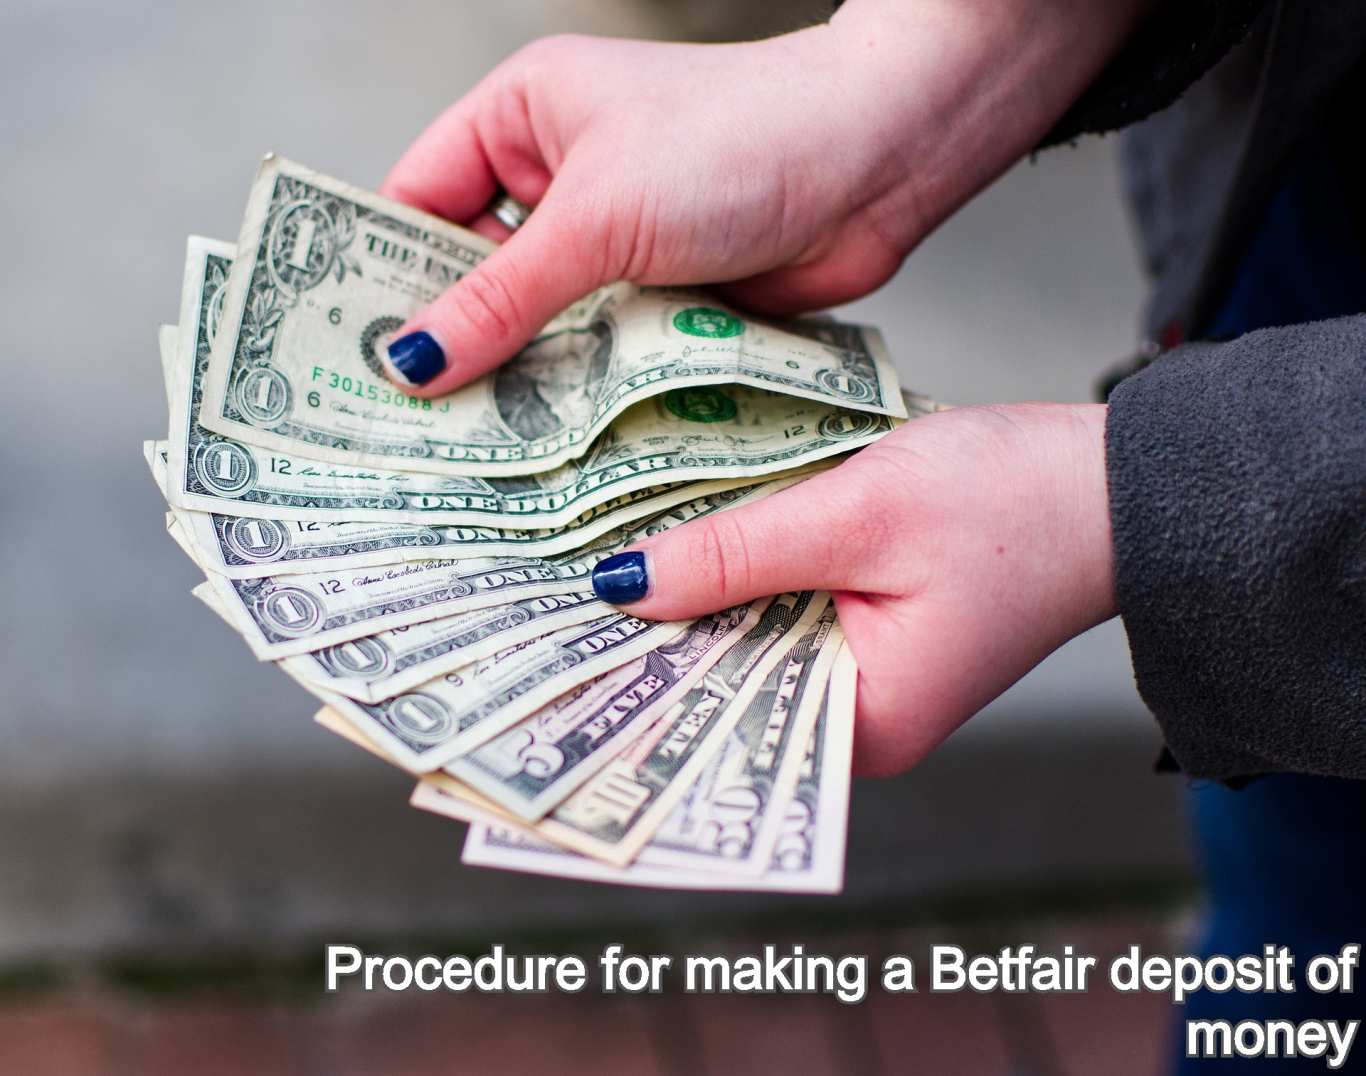 Procedure for making a Betfair deposit of money